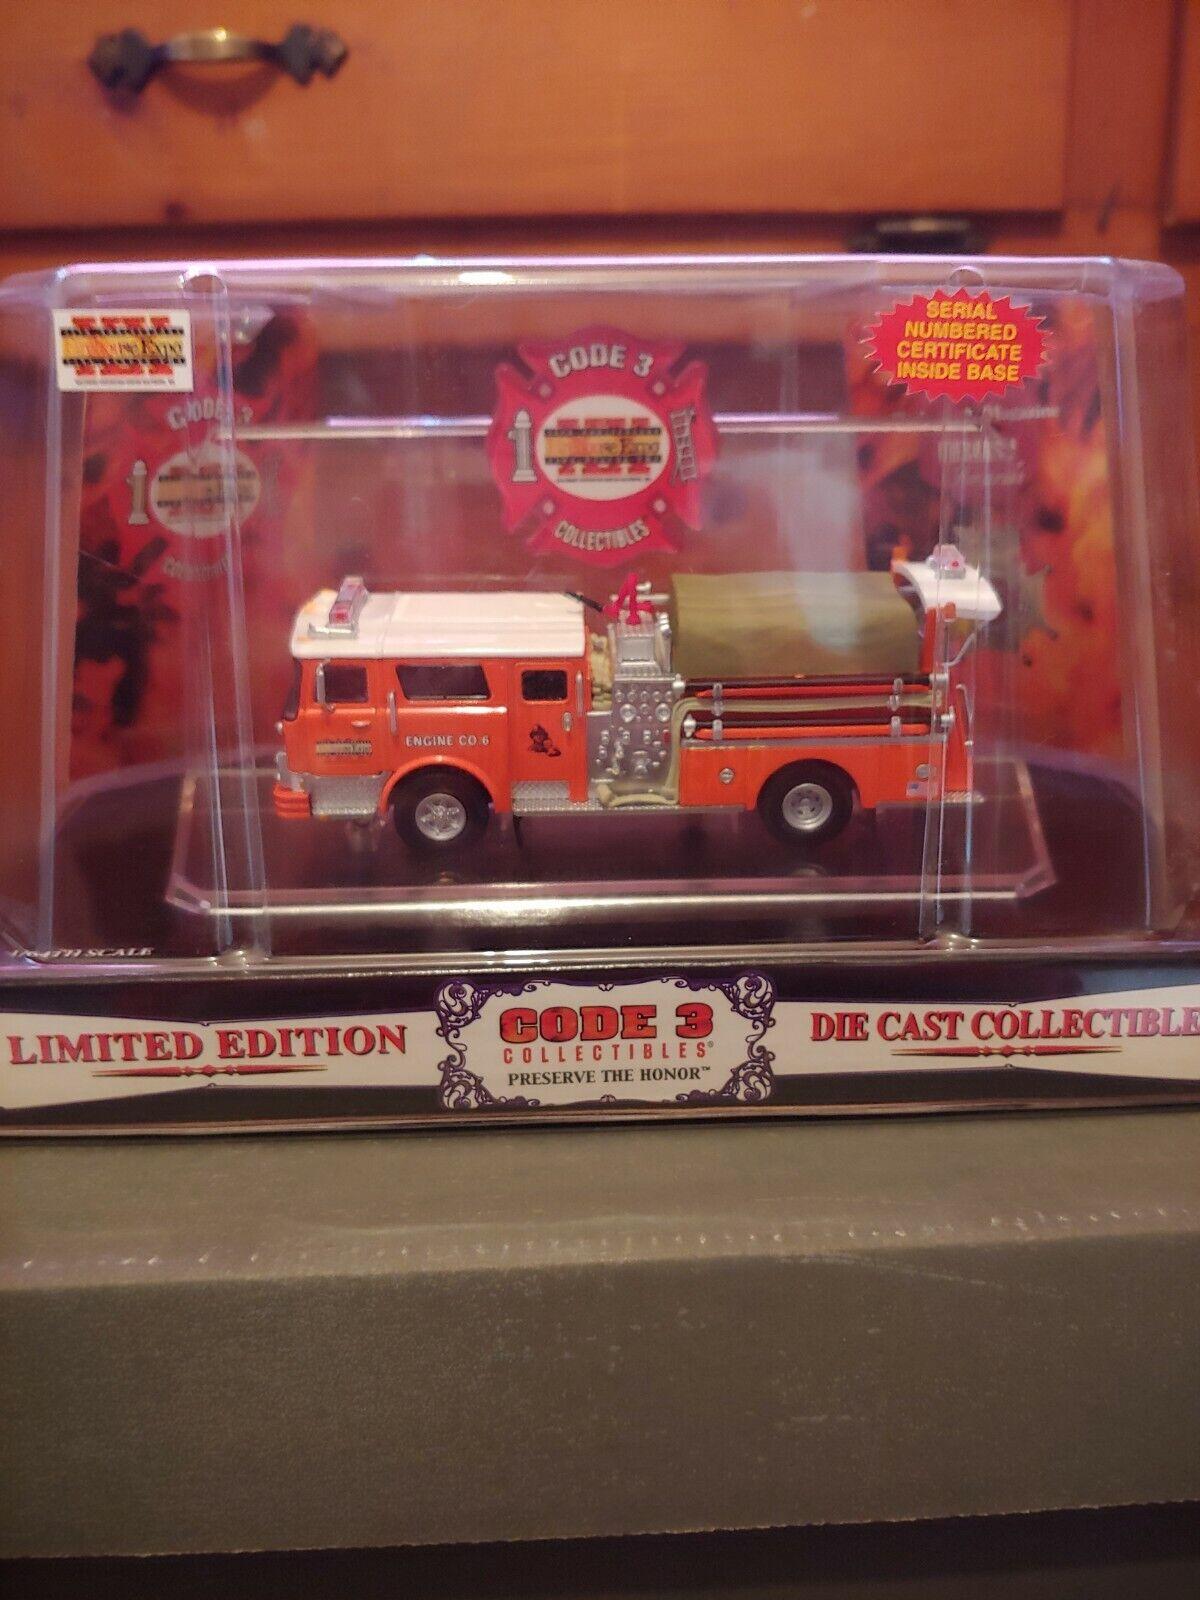 Code 3 Firehouse Expo 2003 Mack CF Pumper (12376)